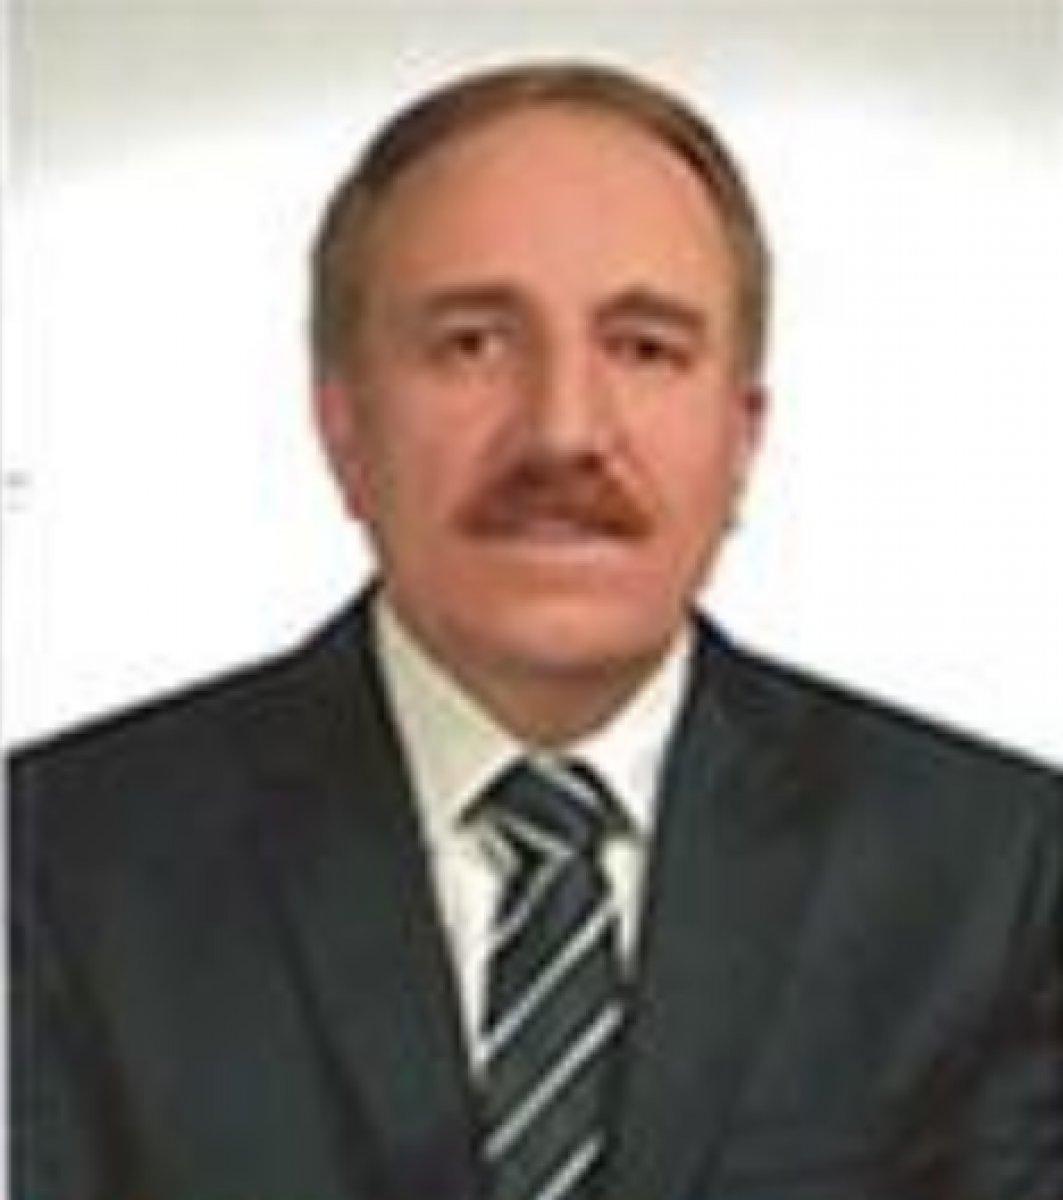 CHP li Esenyurt Belediyesi nde liyakatsiz atamalar #1